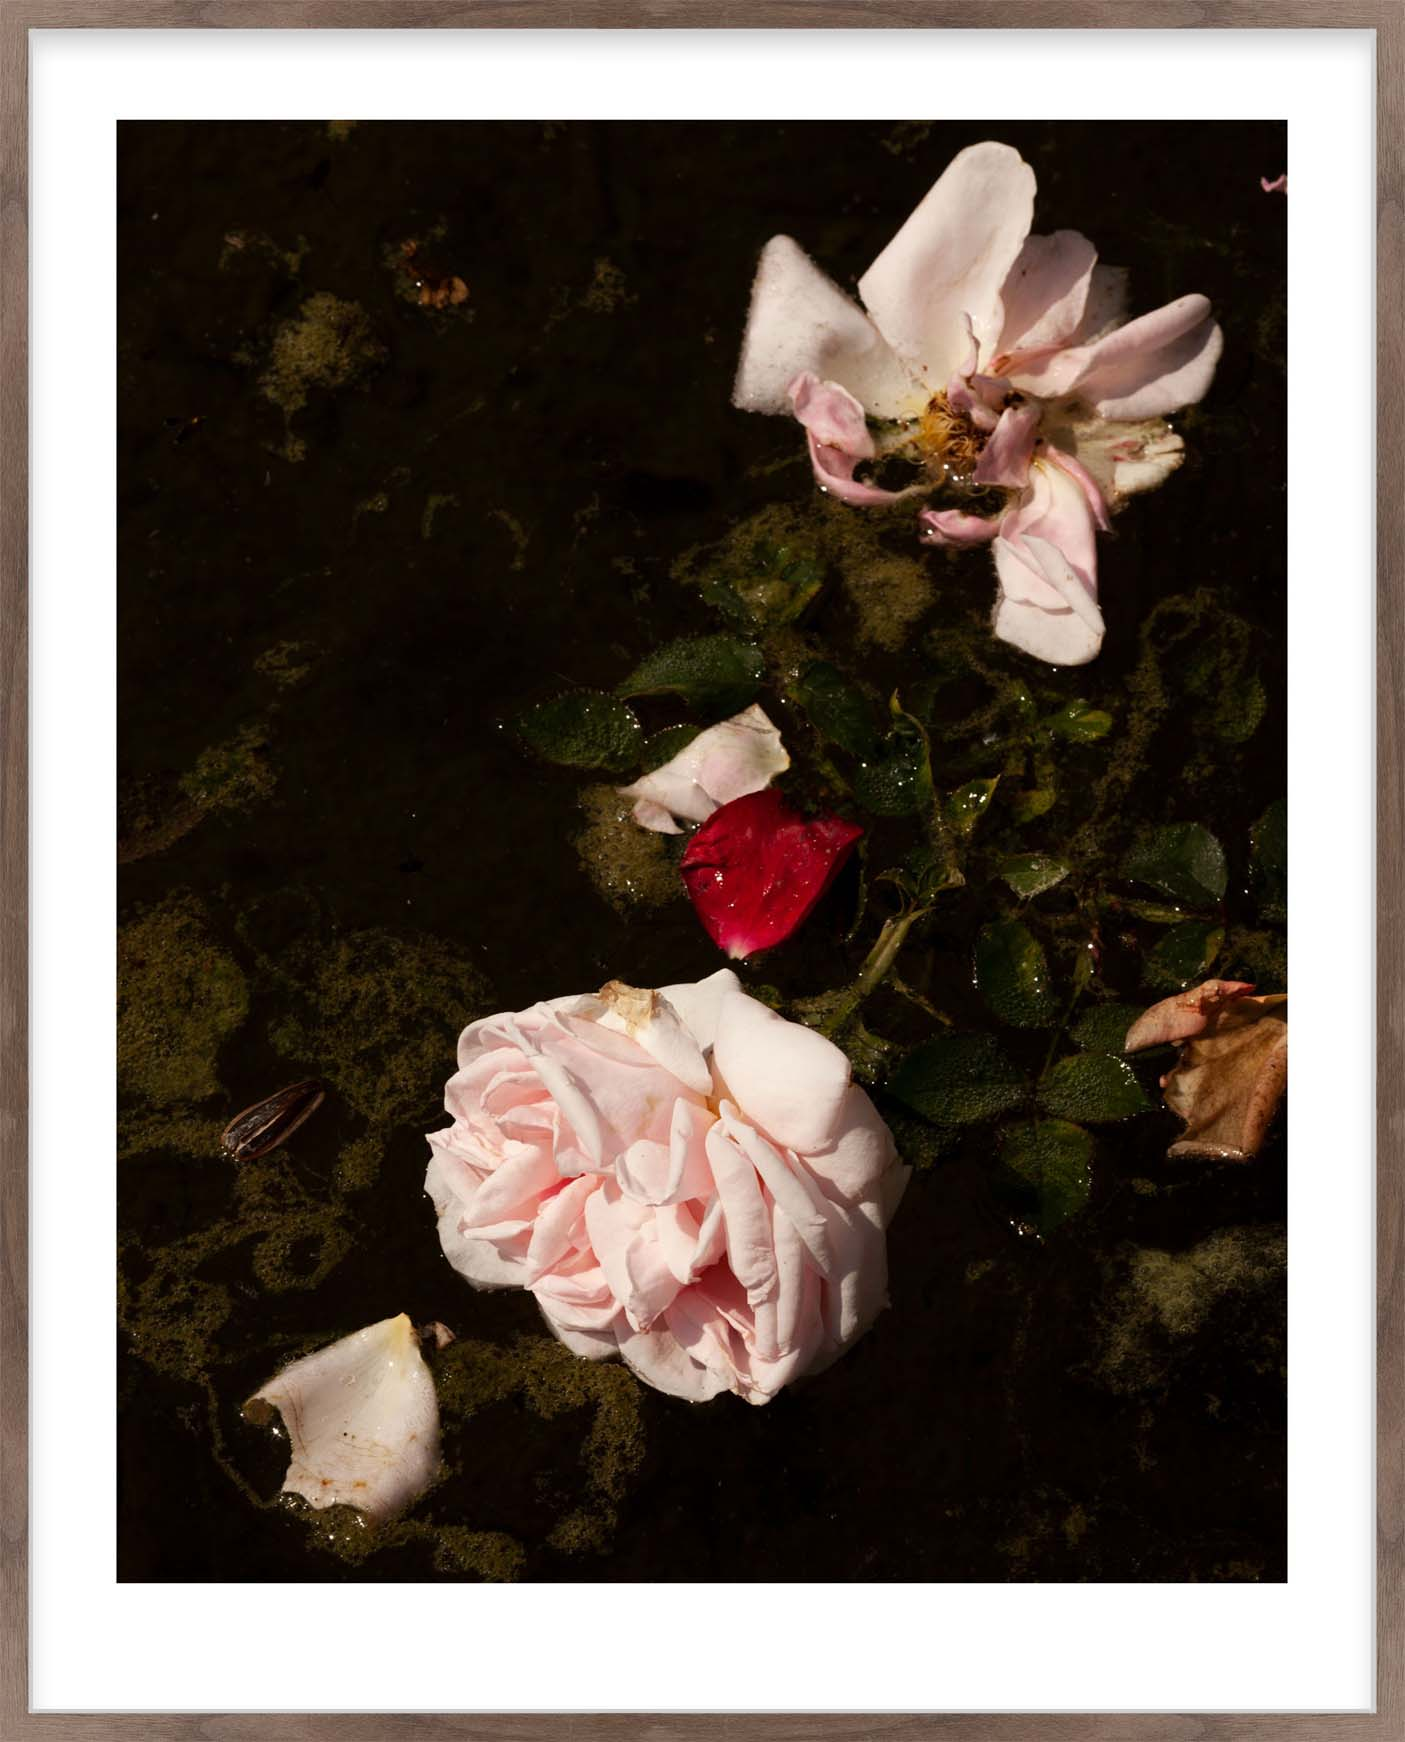 Hang Tough 'Roses, Sludge' Slip Mounted in Walnut (Framing Only)